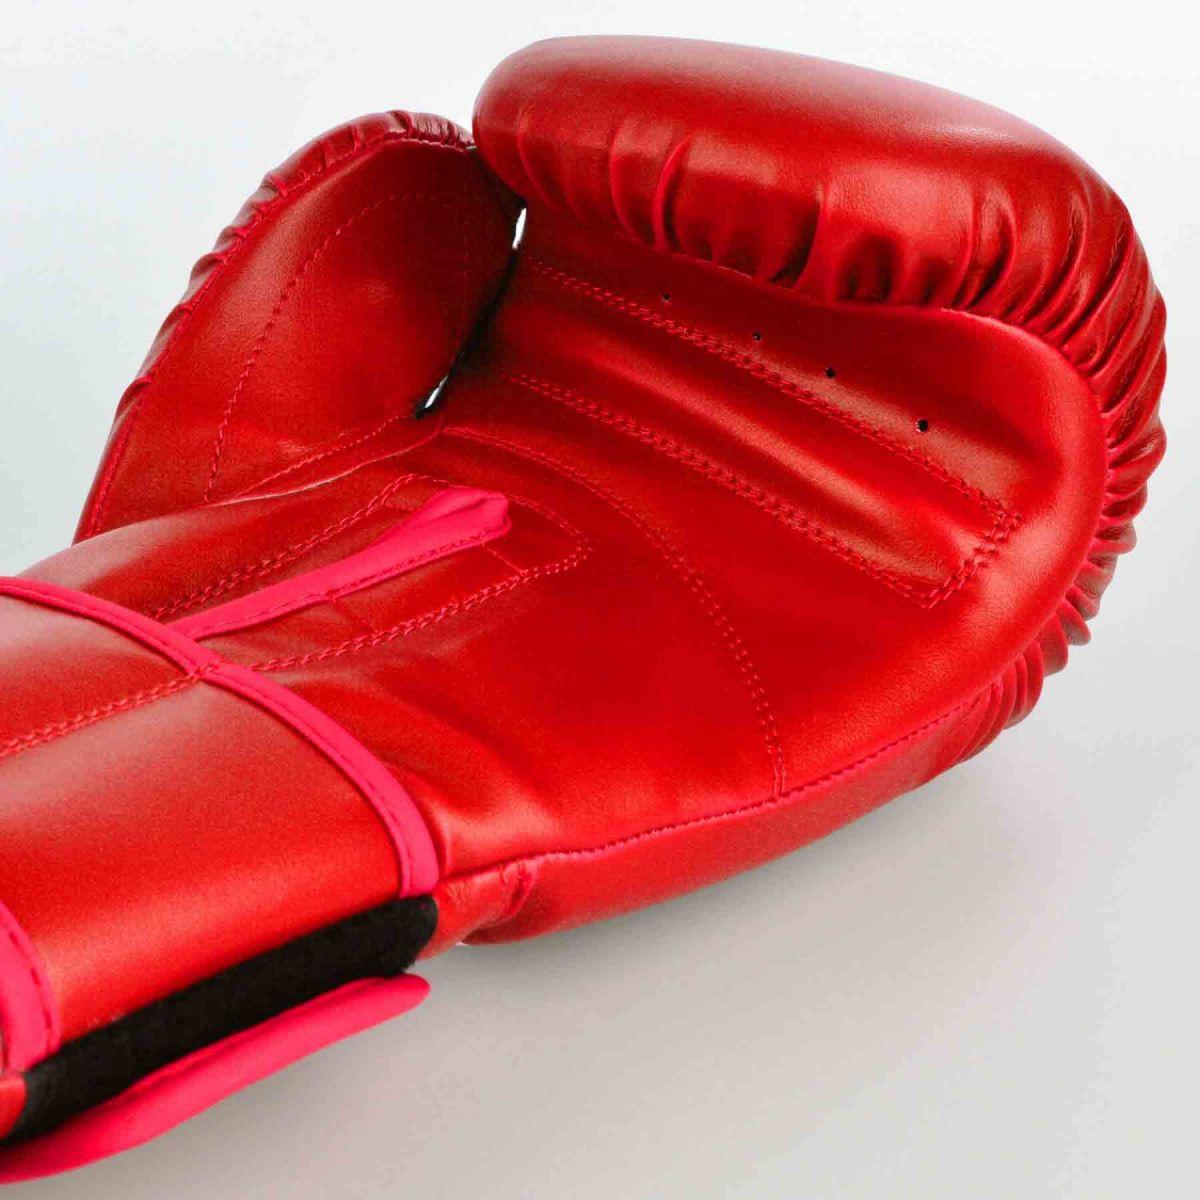 Luvas Boxe / Muay Thai - Cross Trainning- Best Defense - Vermelho - 10/12/14OZ  - Loja do Competidor